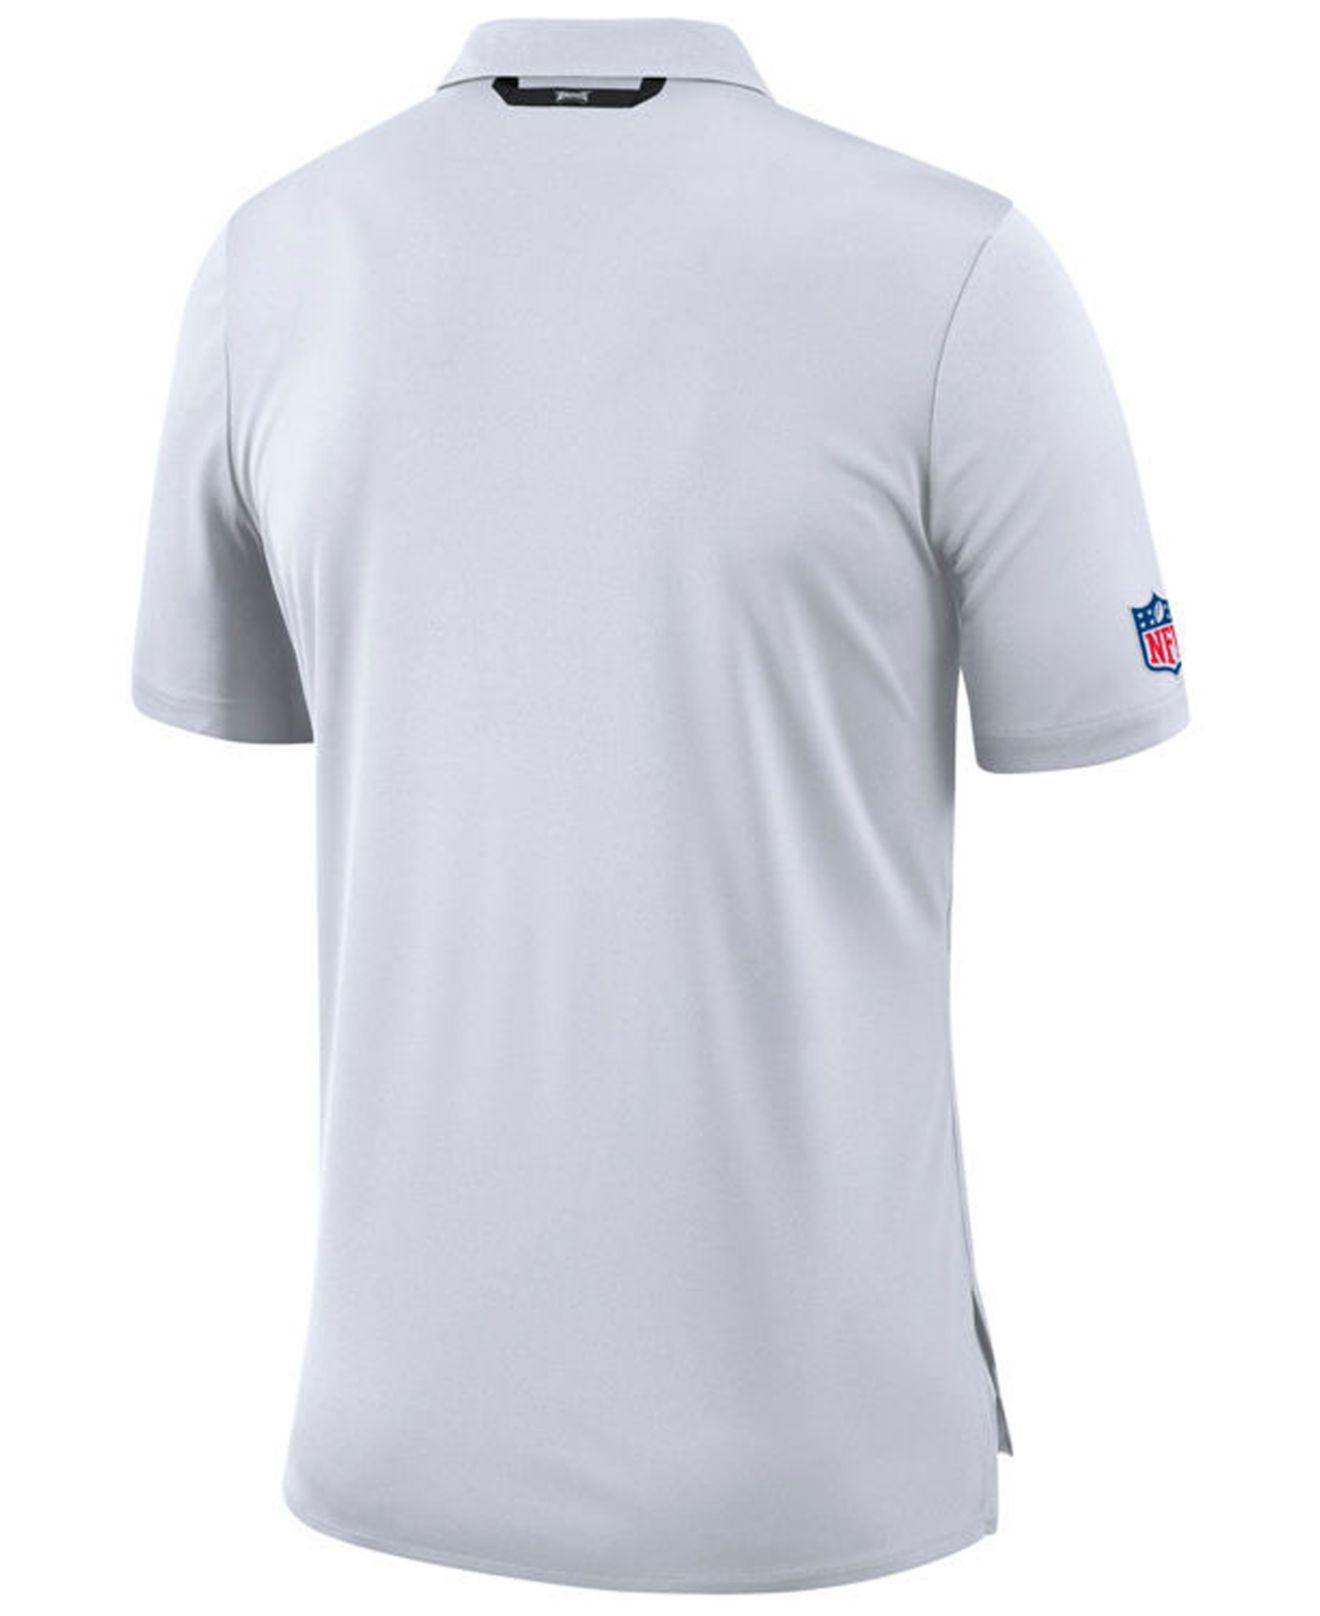 904e36735 Lyst - Nike Philadelphia Eagles Early Season Polo in White for Men